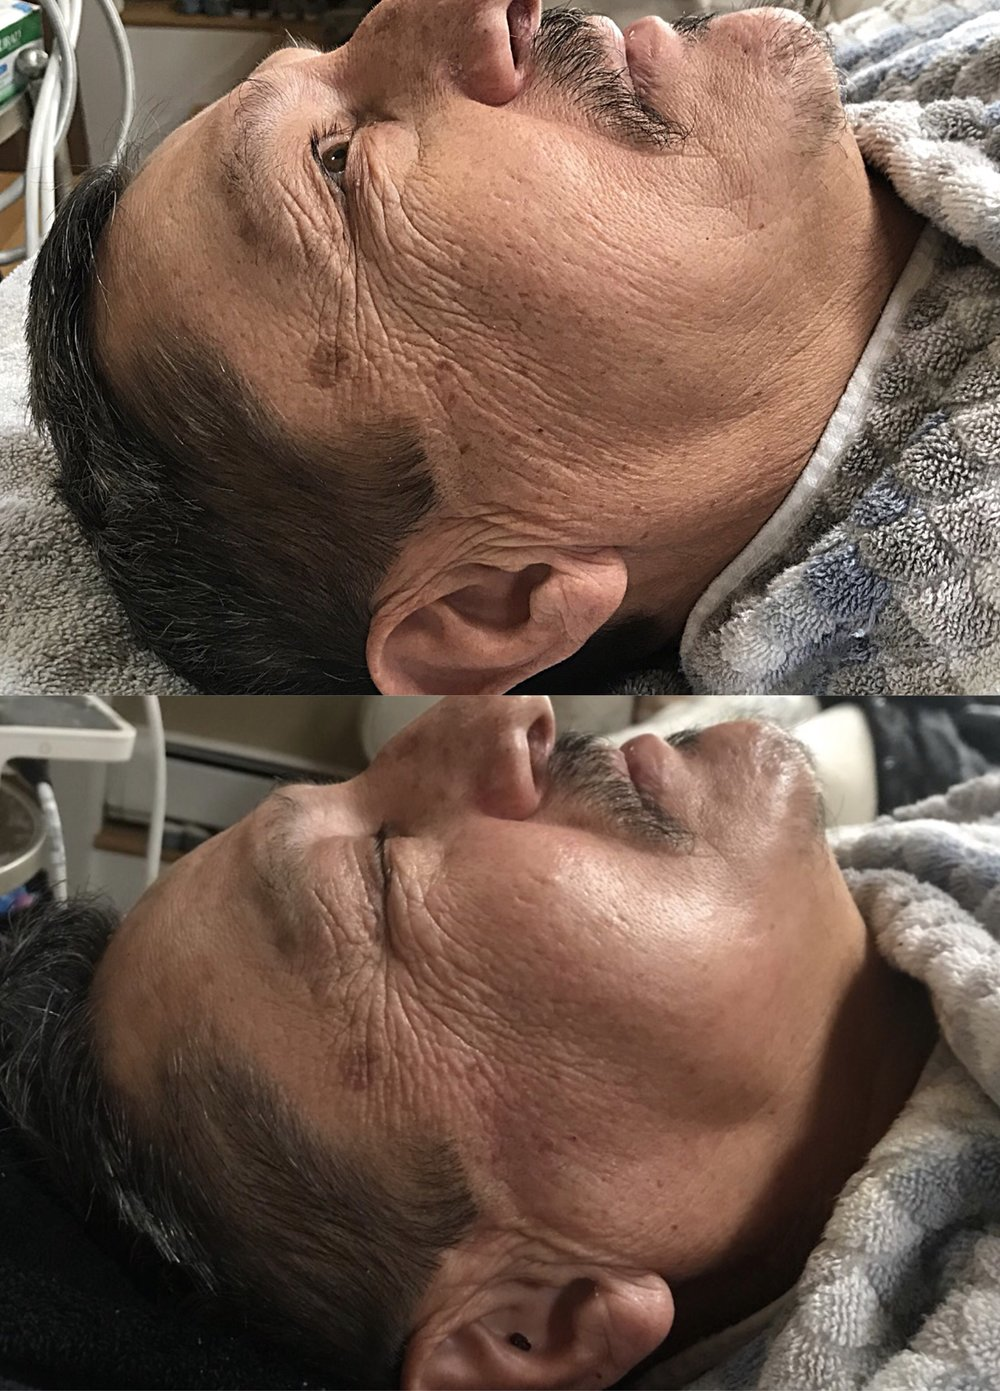 Results Shown Immediately Post Skin Genesis Treatment